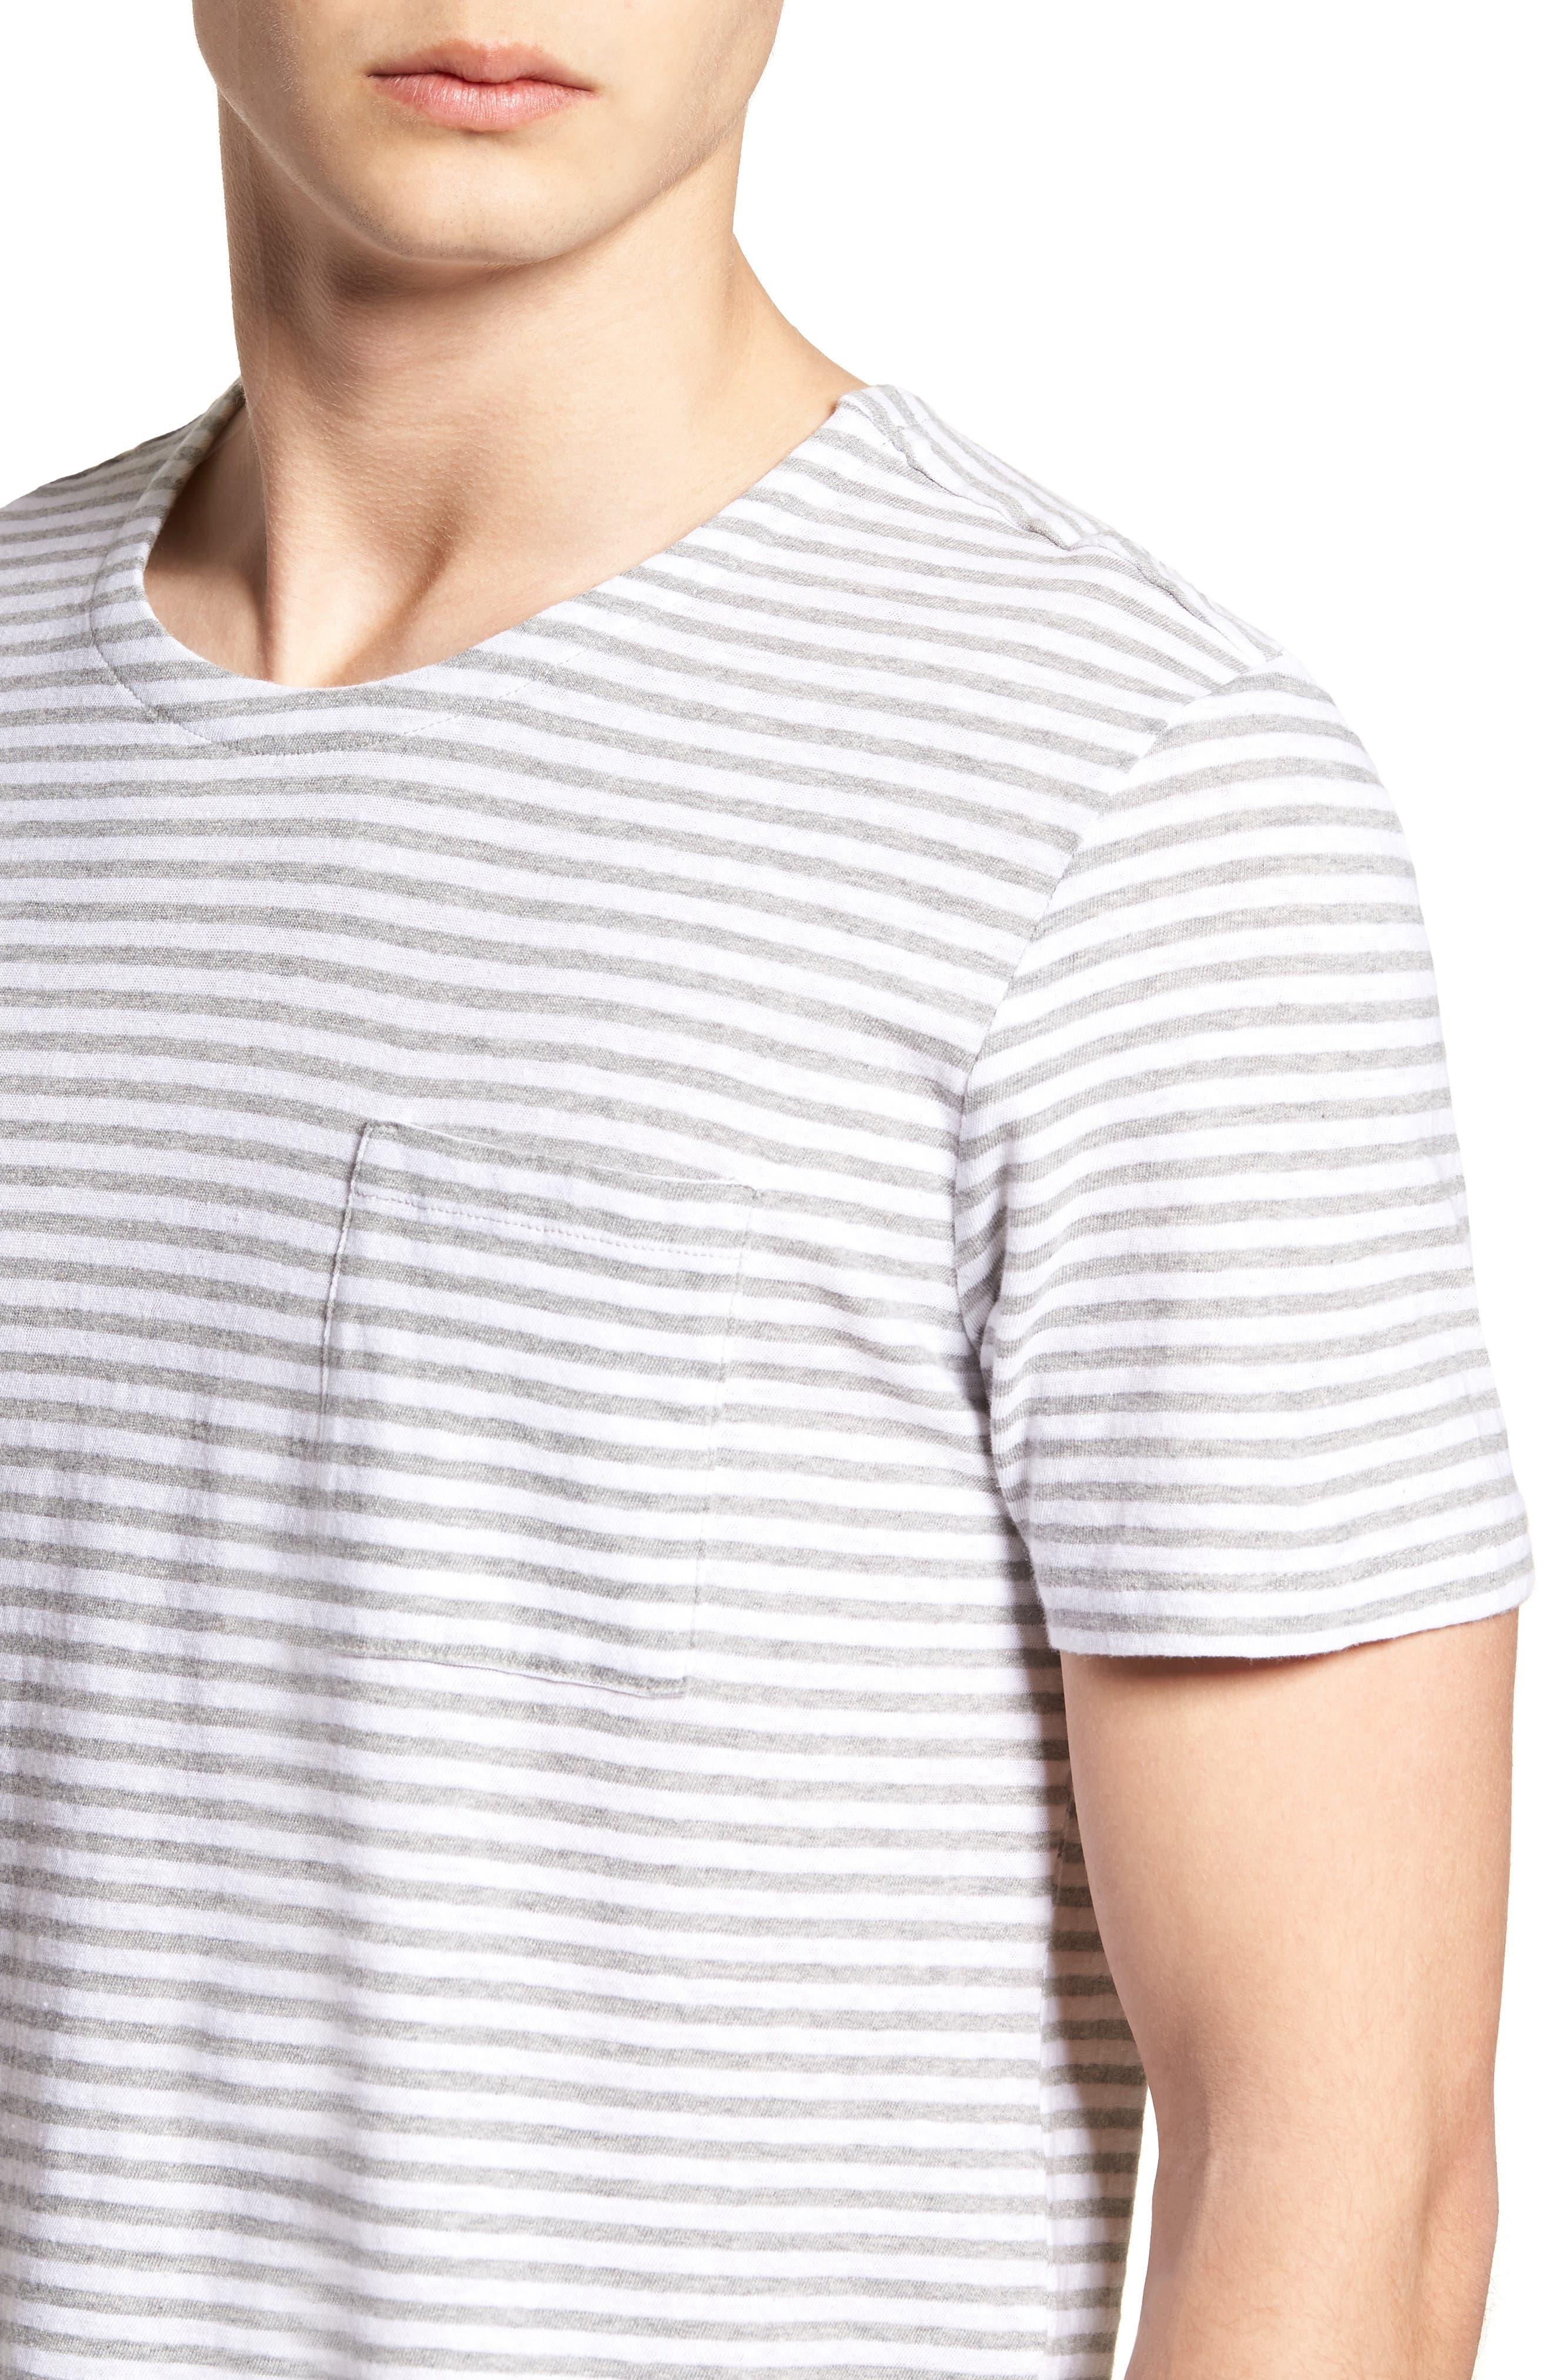 & Bros. Stripe Crewneck T-Shirt,                             Alternate thumbnail 4, color,                             156